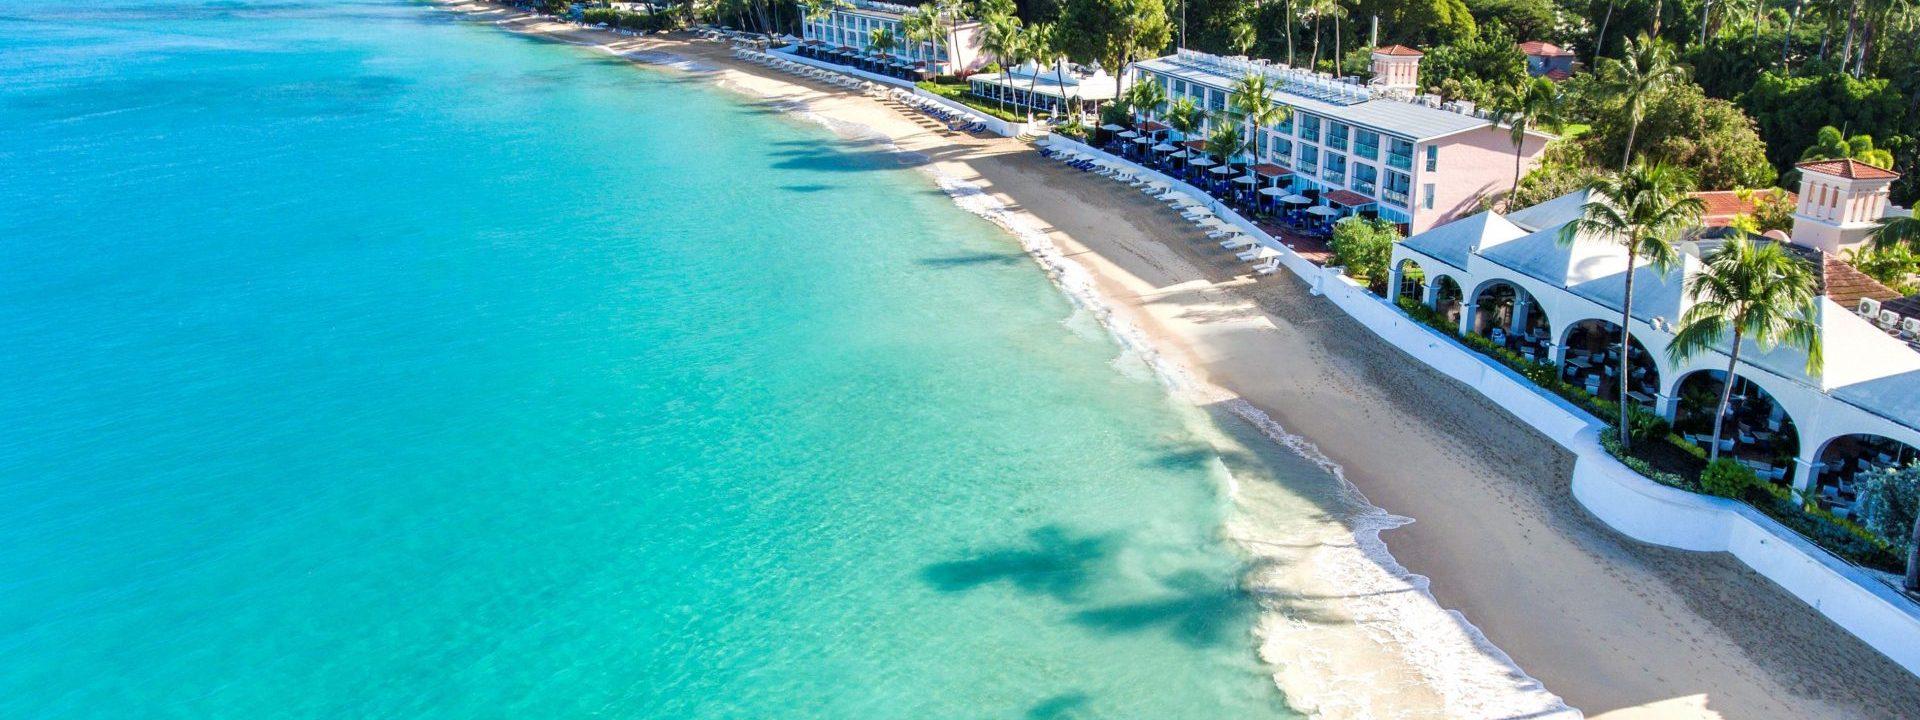 Barbados' Fairmont Royal Pavilion offers an idyllic beachfront setting